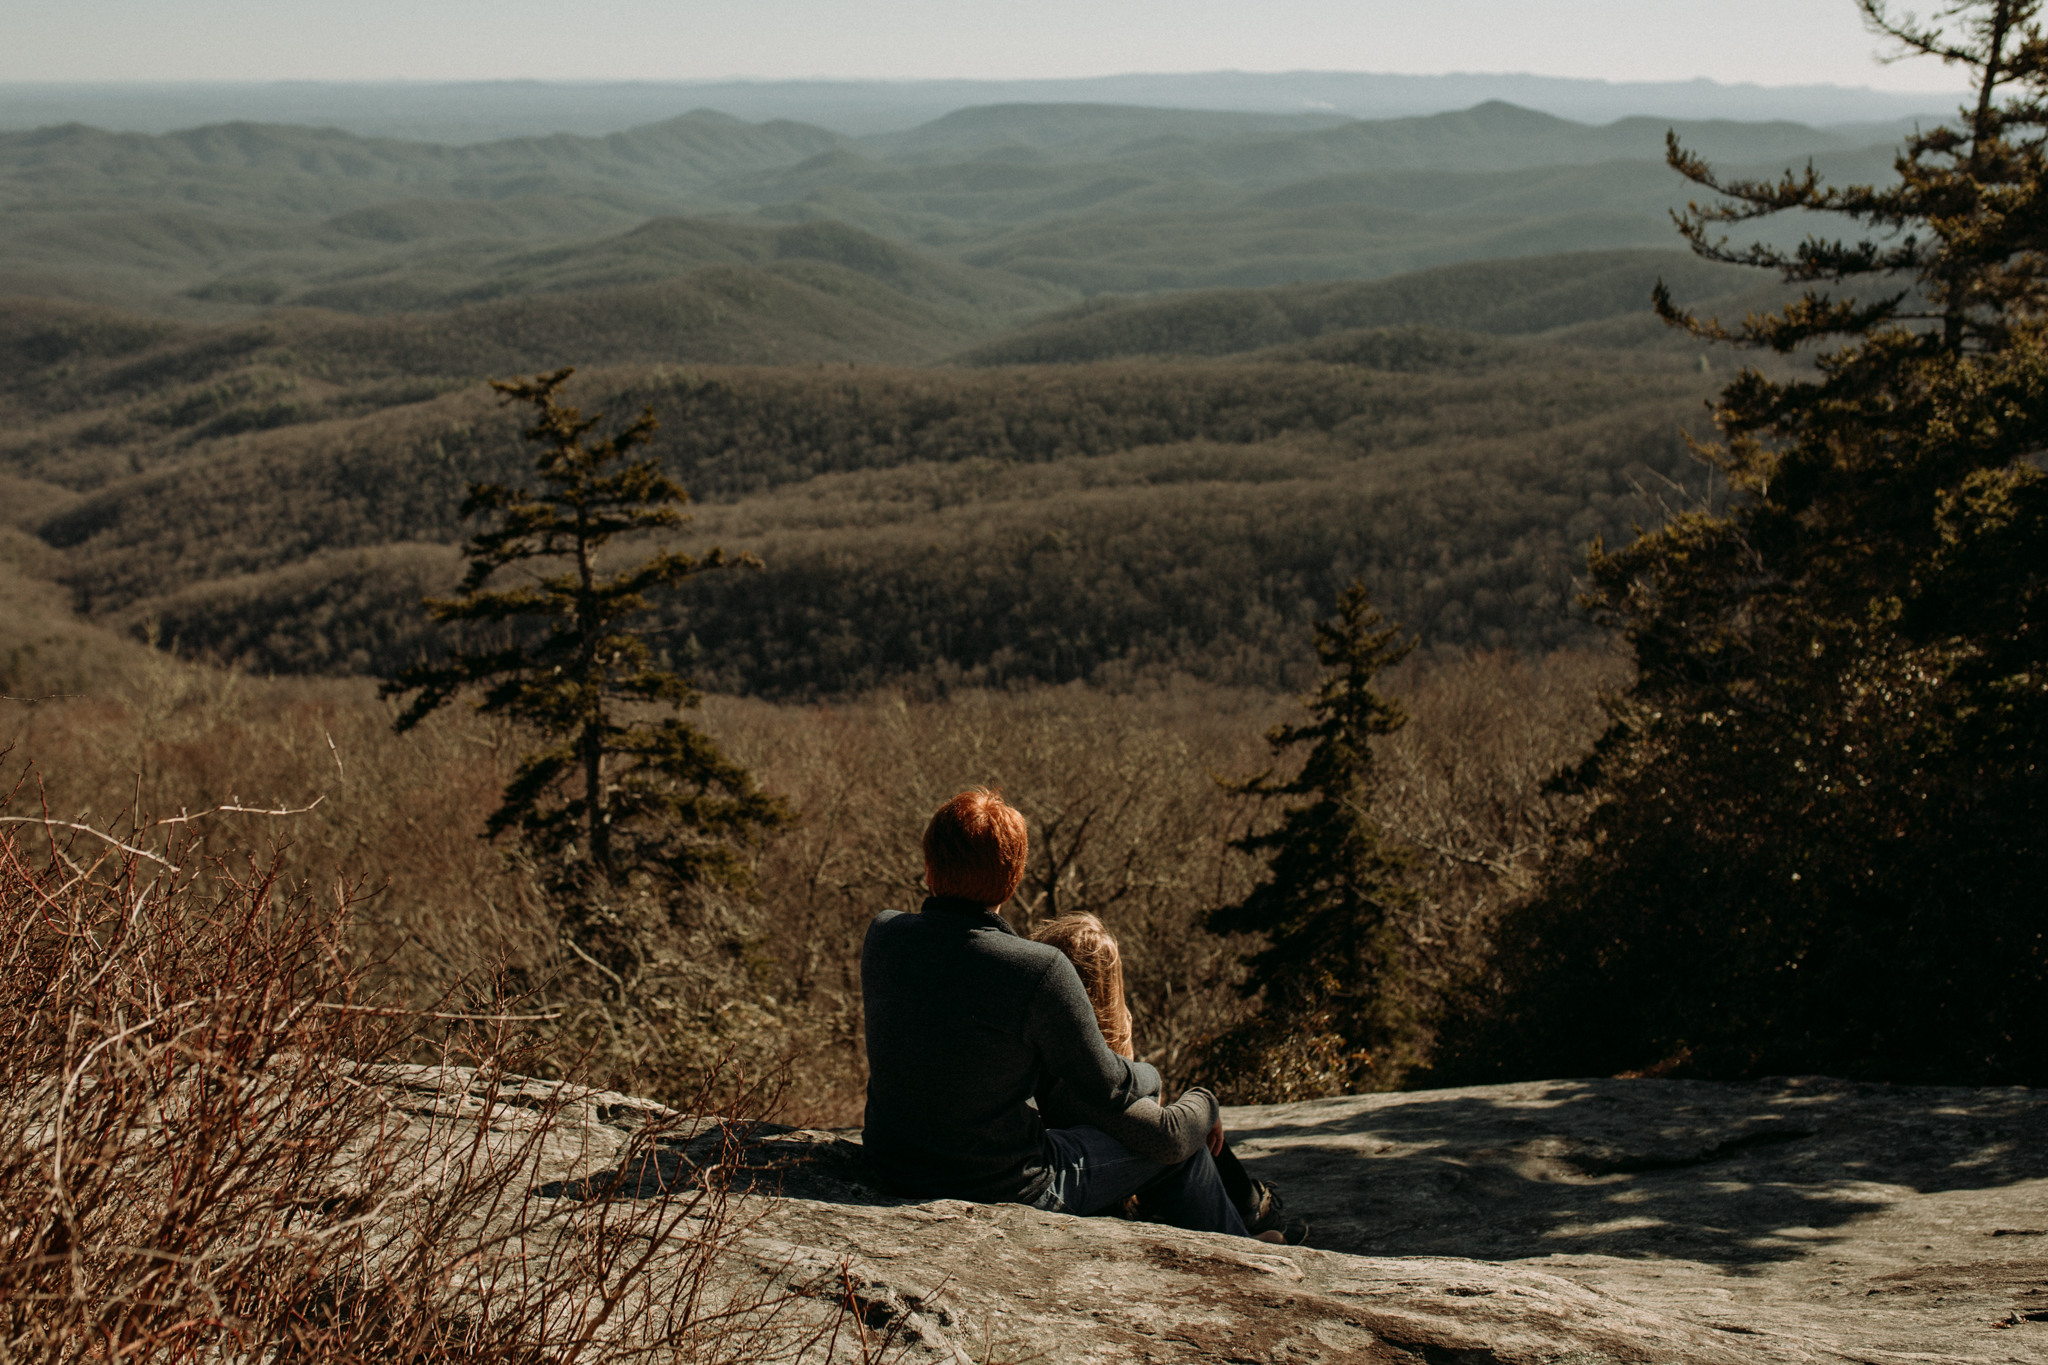 MonicaLeavellPhoto-AshleyMitch-NorthCarolina-Adventure-Engagement-Photographer-6.jpg